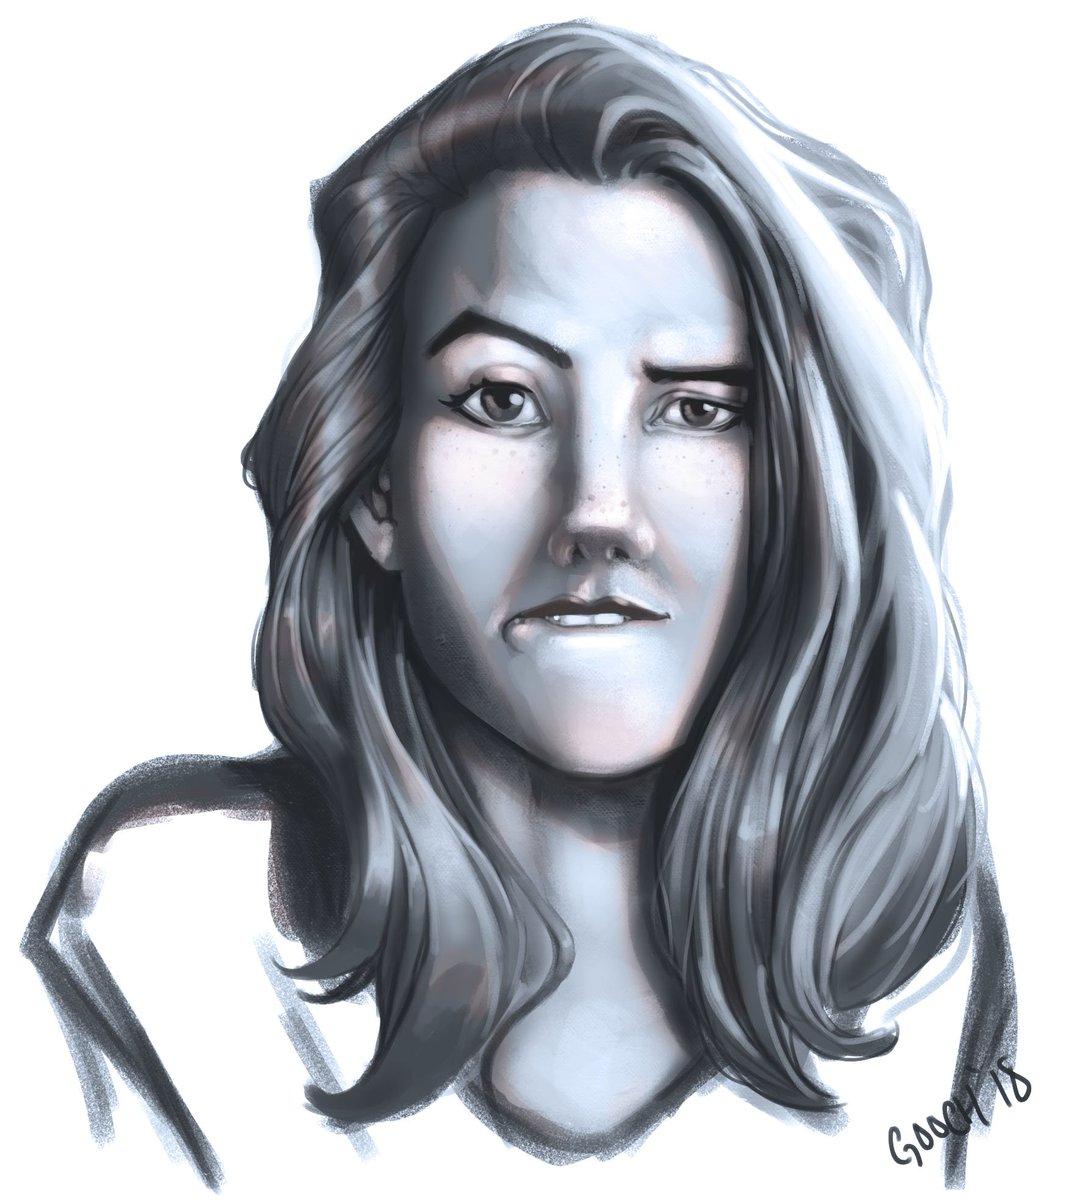 doodlin' time #drawing #sketch #facestudy #artofinstagram #photoshop #portraitsketch #wacompic.twitter.com/PugF0SeP1V